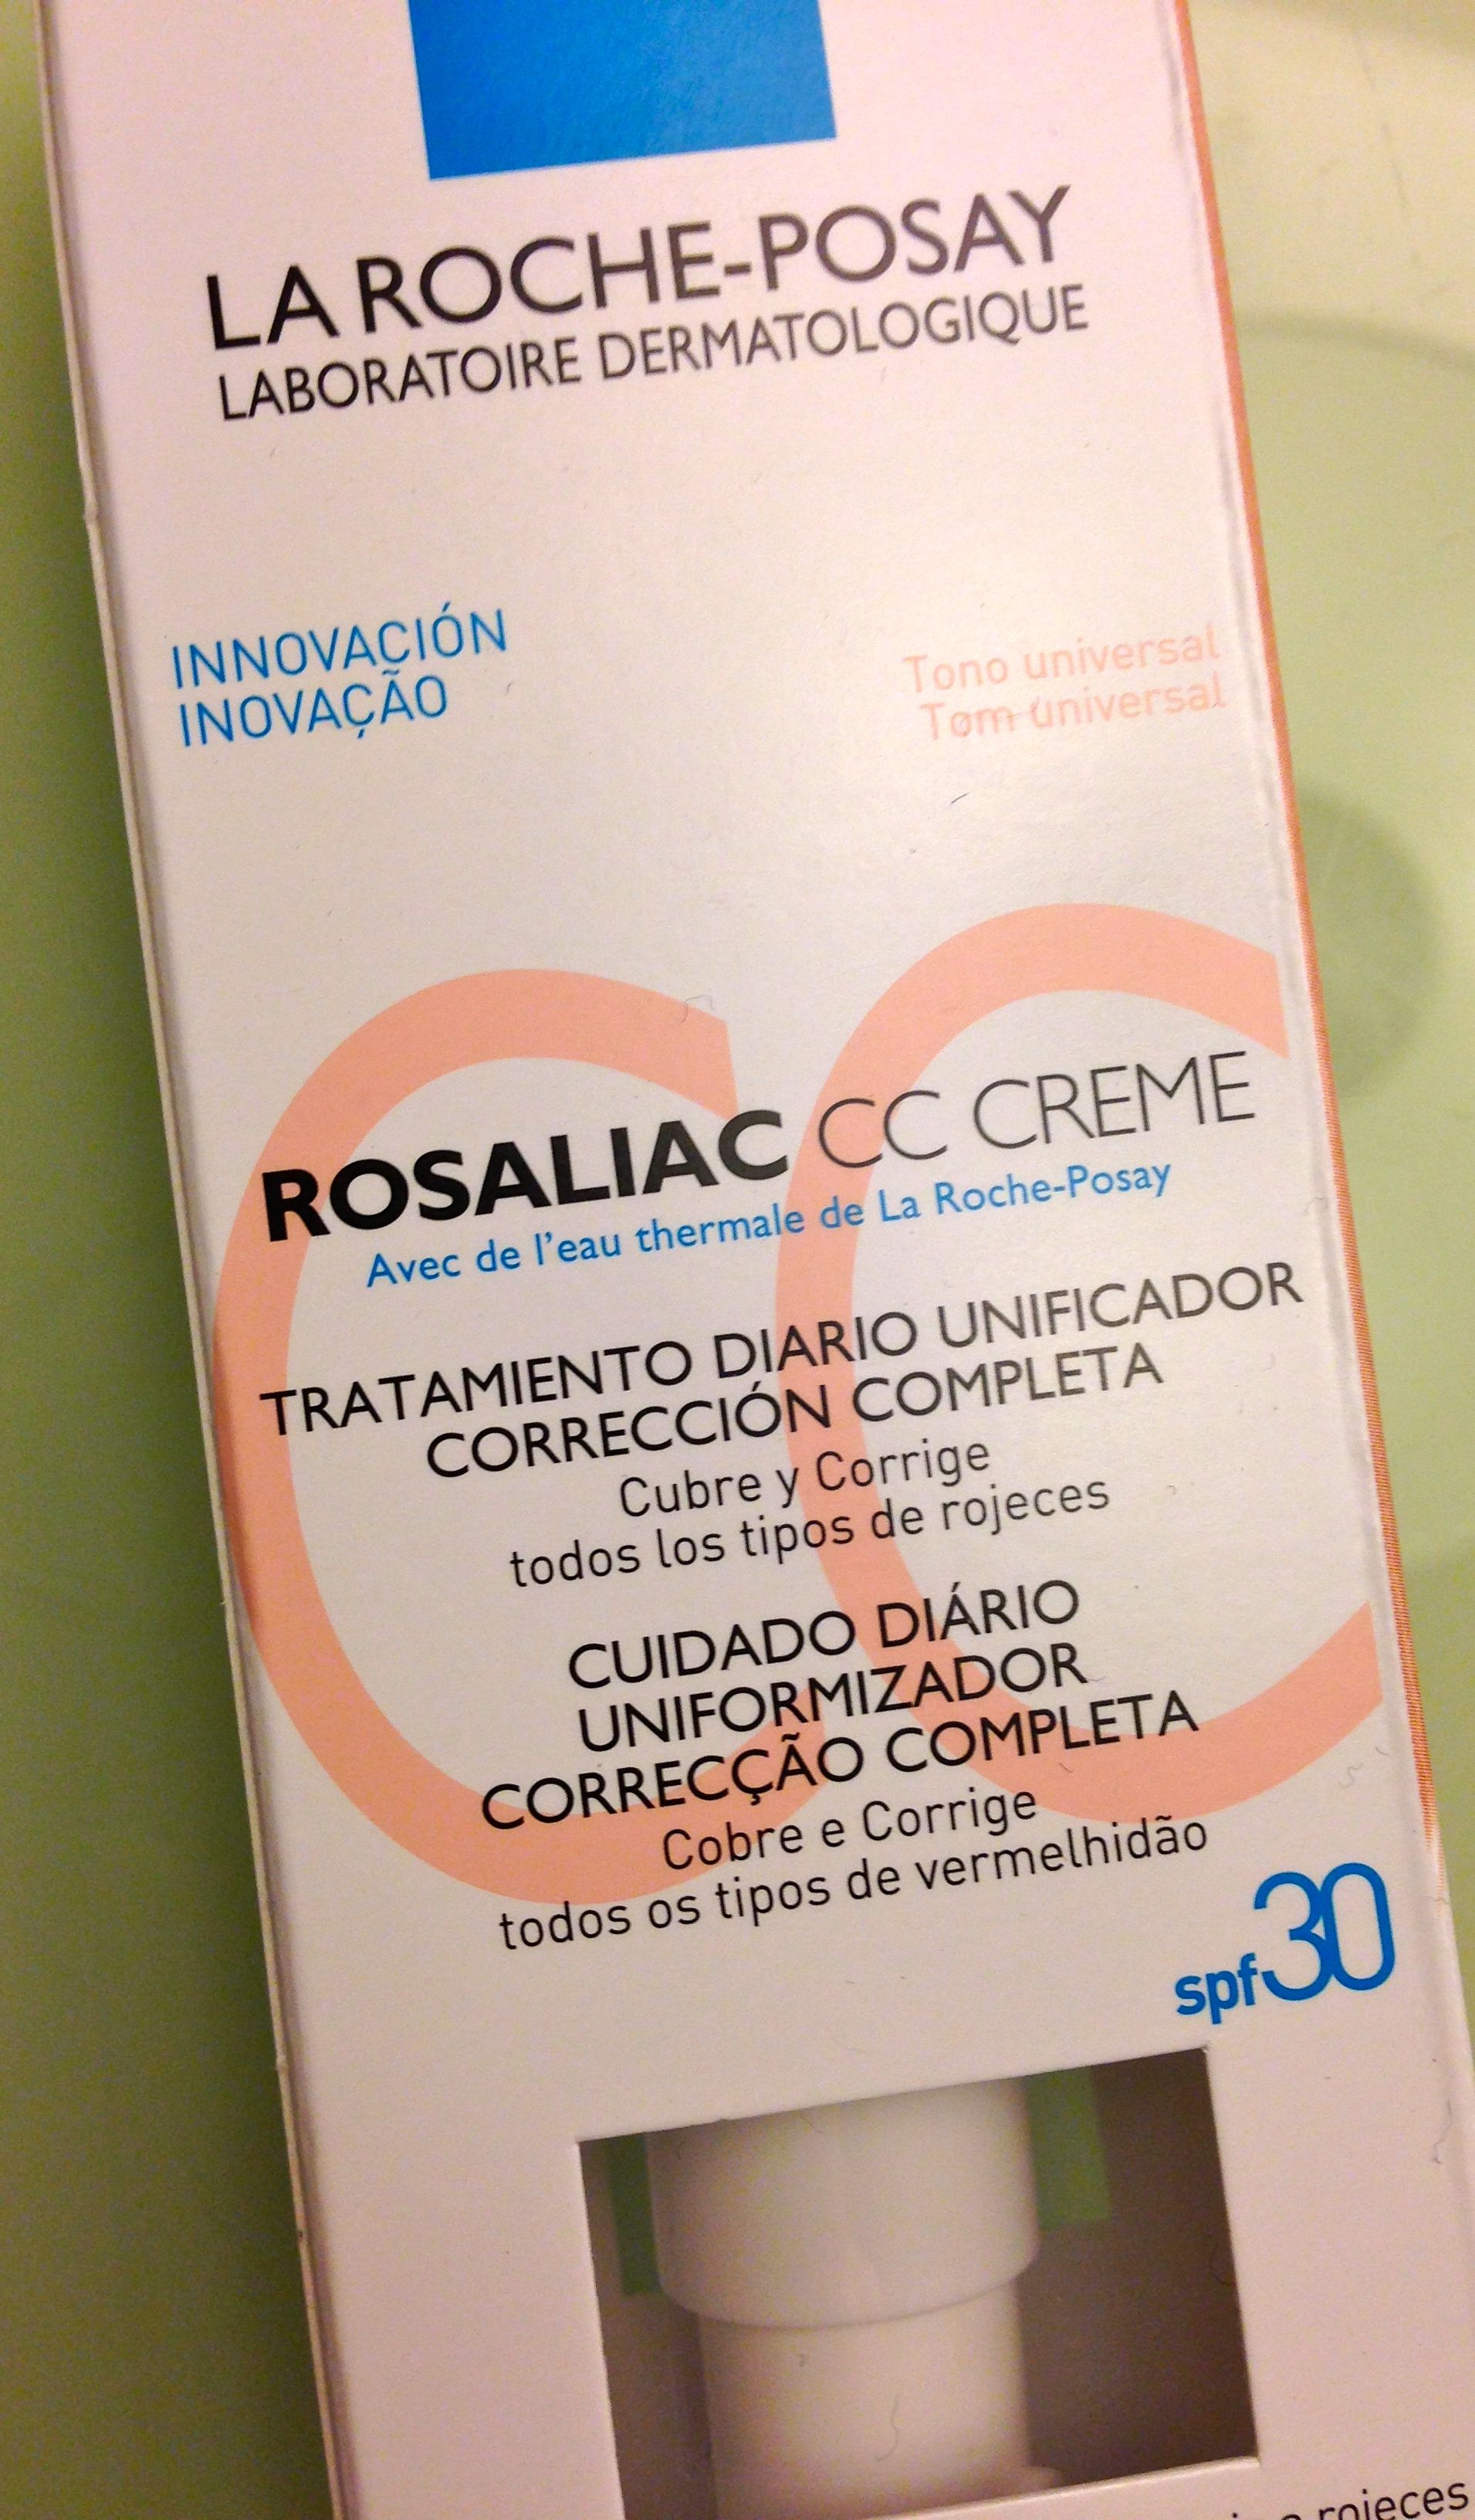 La Roche Posay Rosaliac Cc Cream Creme De Pele Unhas E Saude